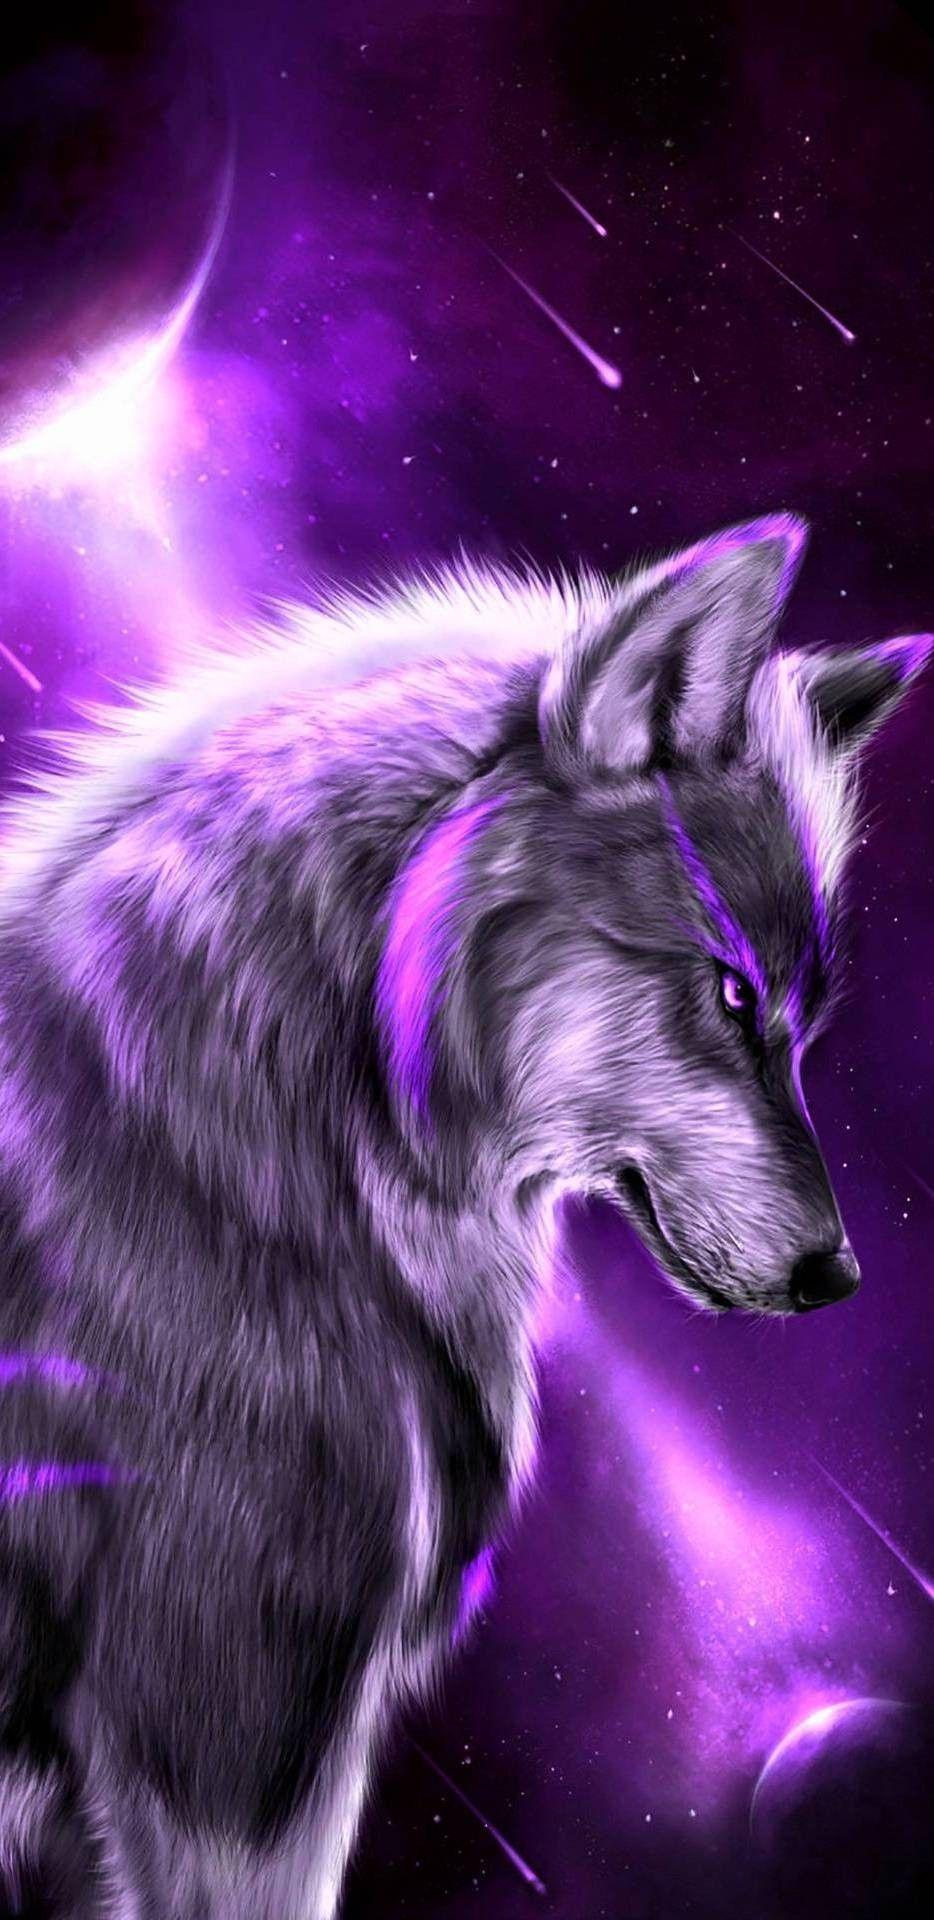 Pin Oleh Sheila Richard Di Canvas Gambar Serigala Serigala Melolong Binatang